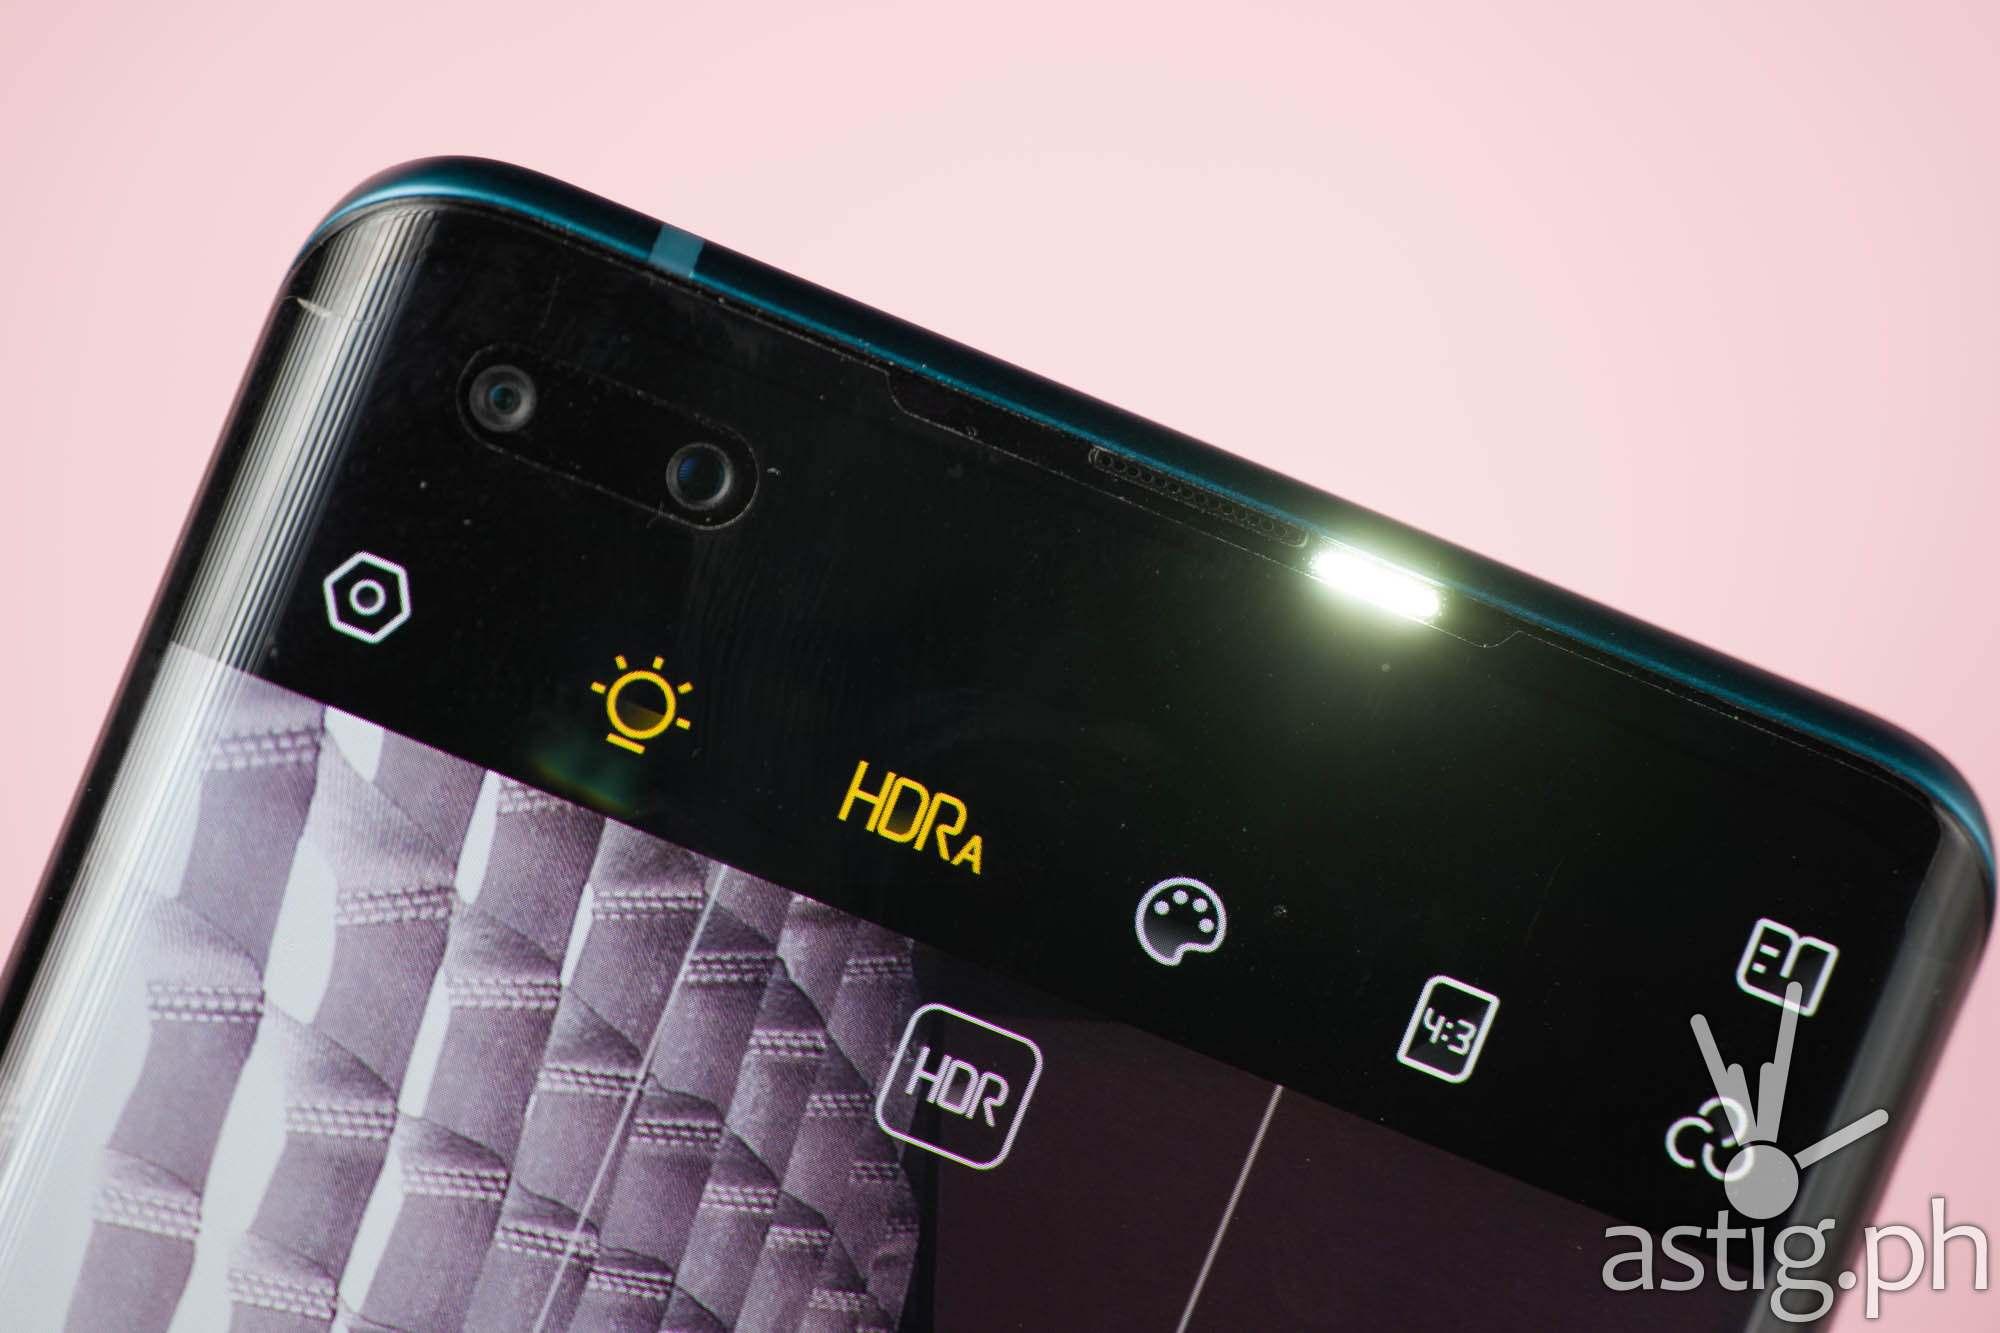 Selfie with dual LED flash - TECNO PHANTOM X (Philippines)